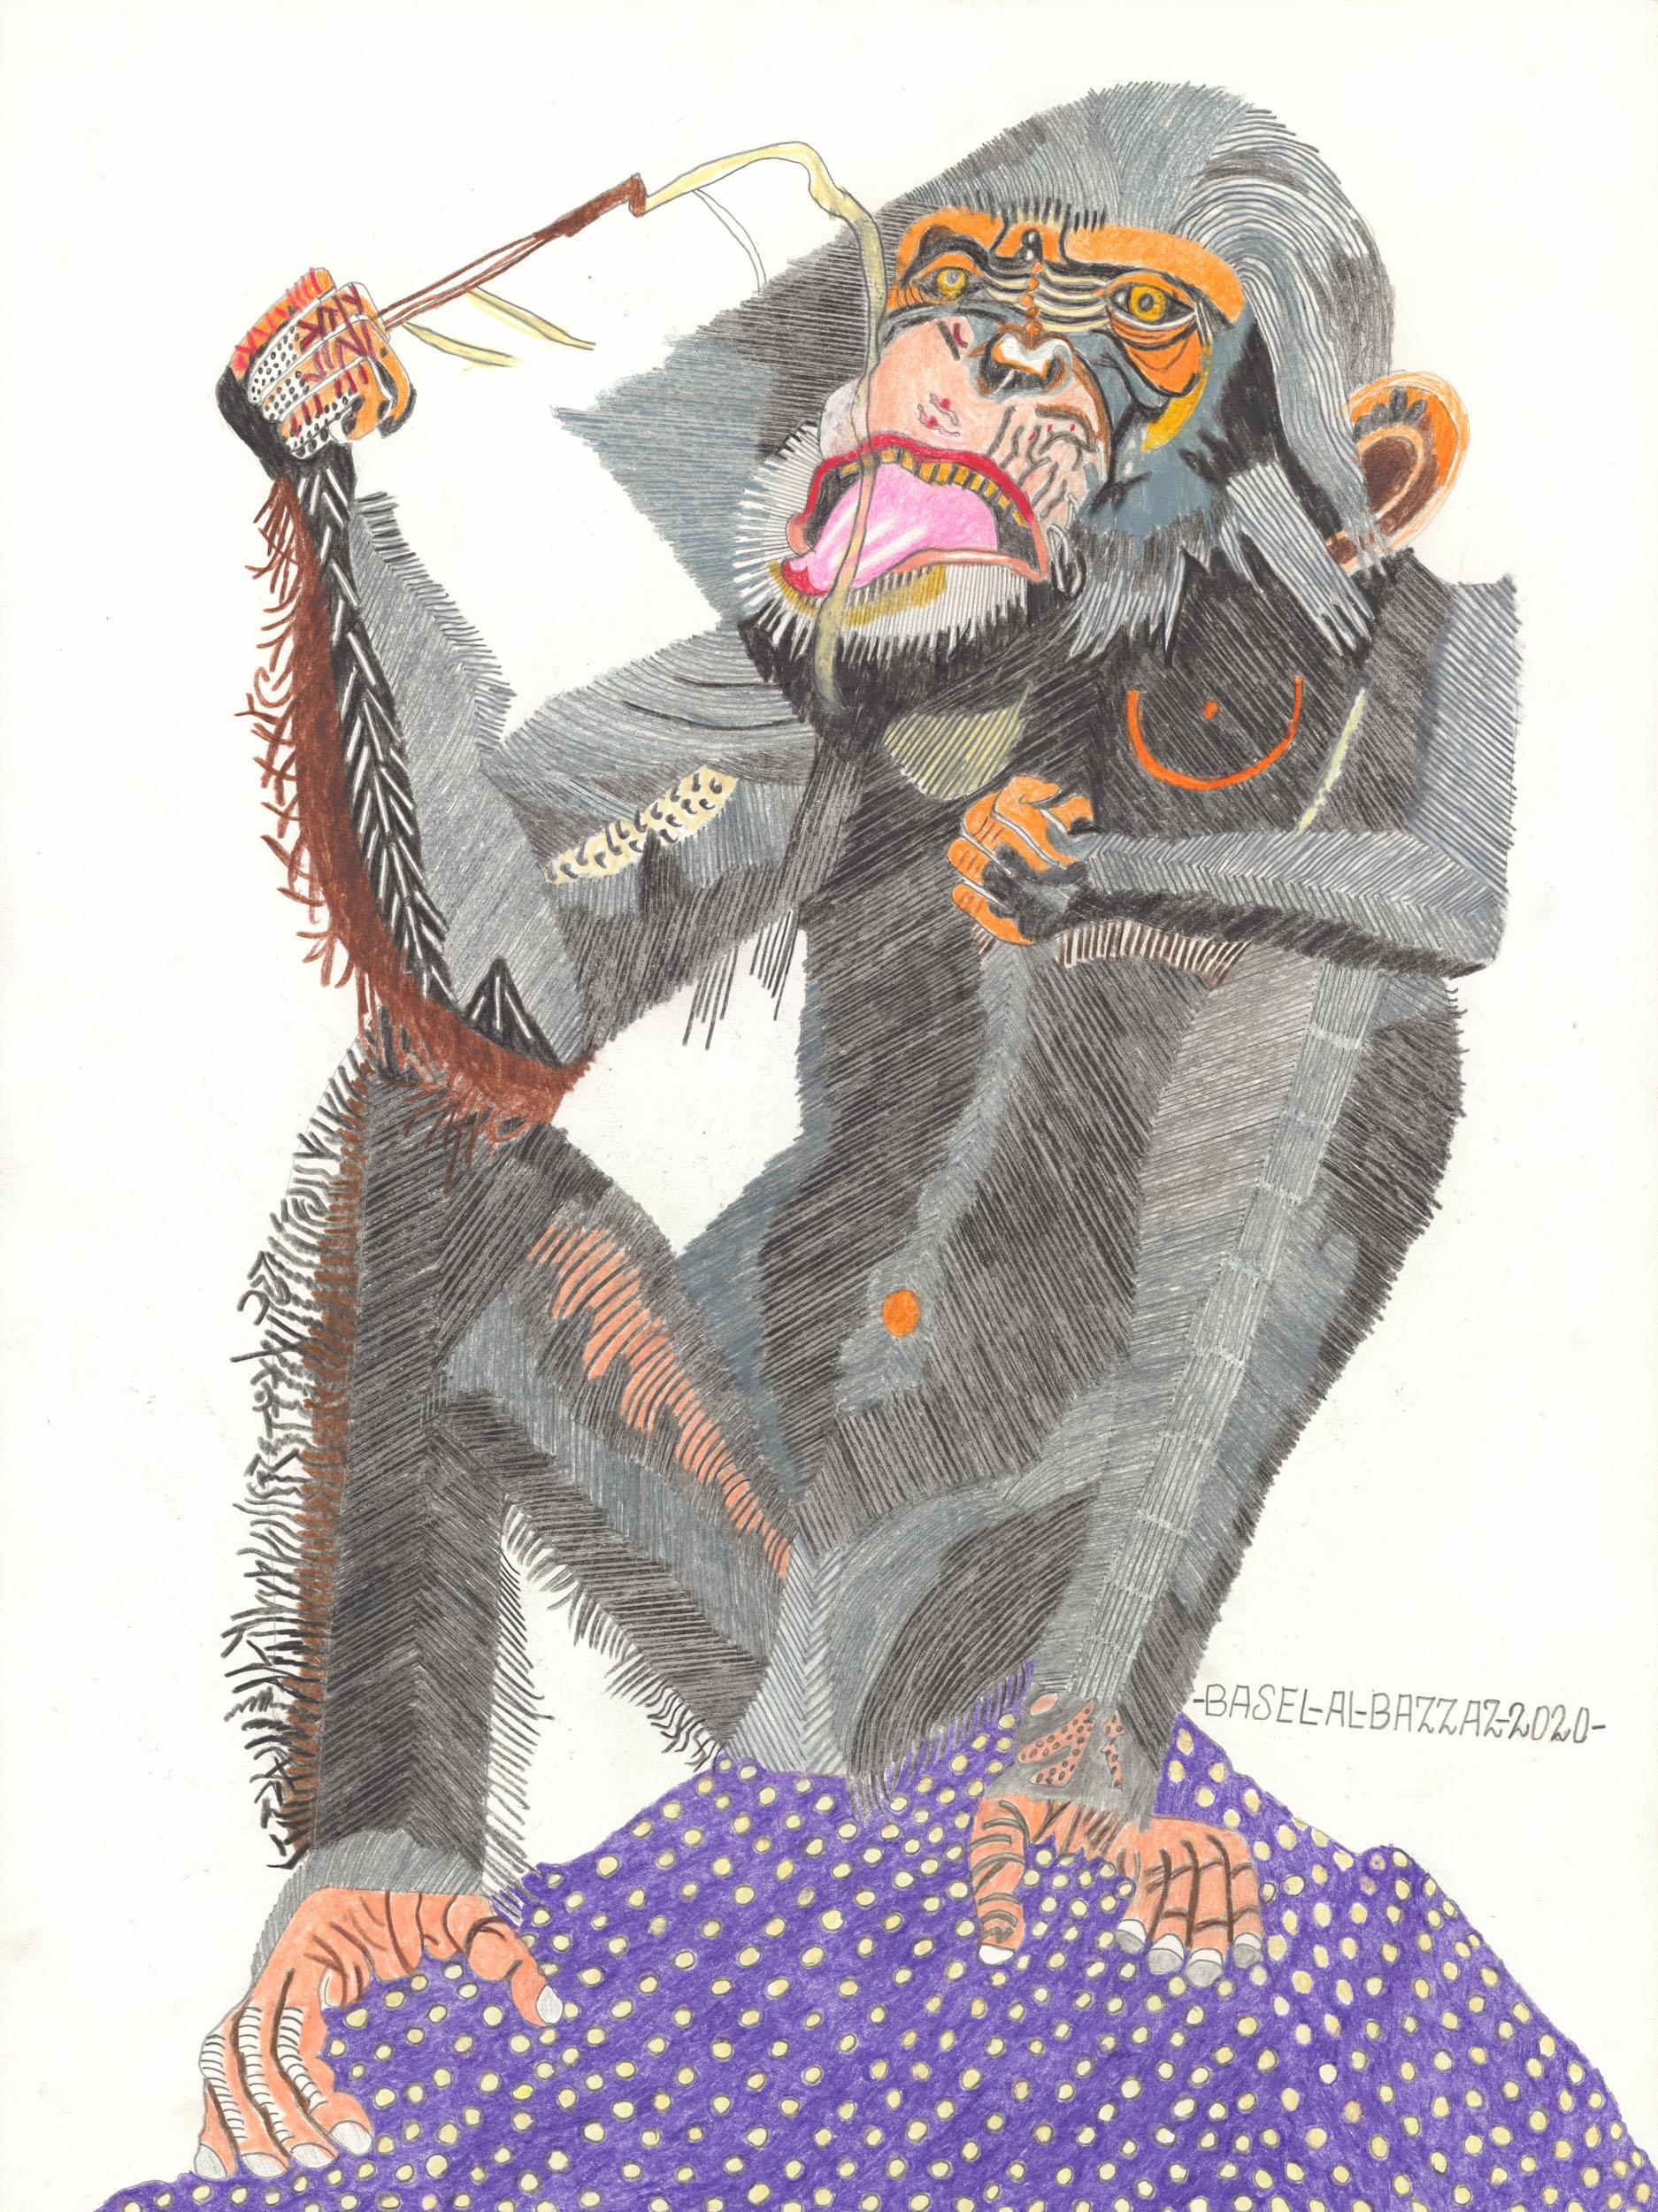 al-bazzaz basel - Schimpansenjause / Chimpanzee snack